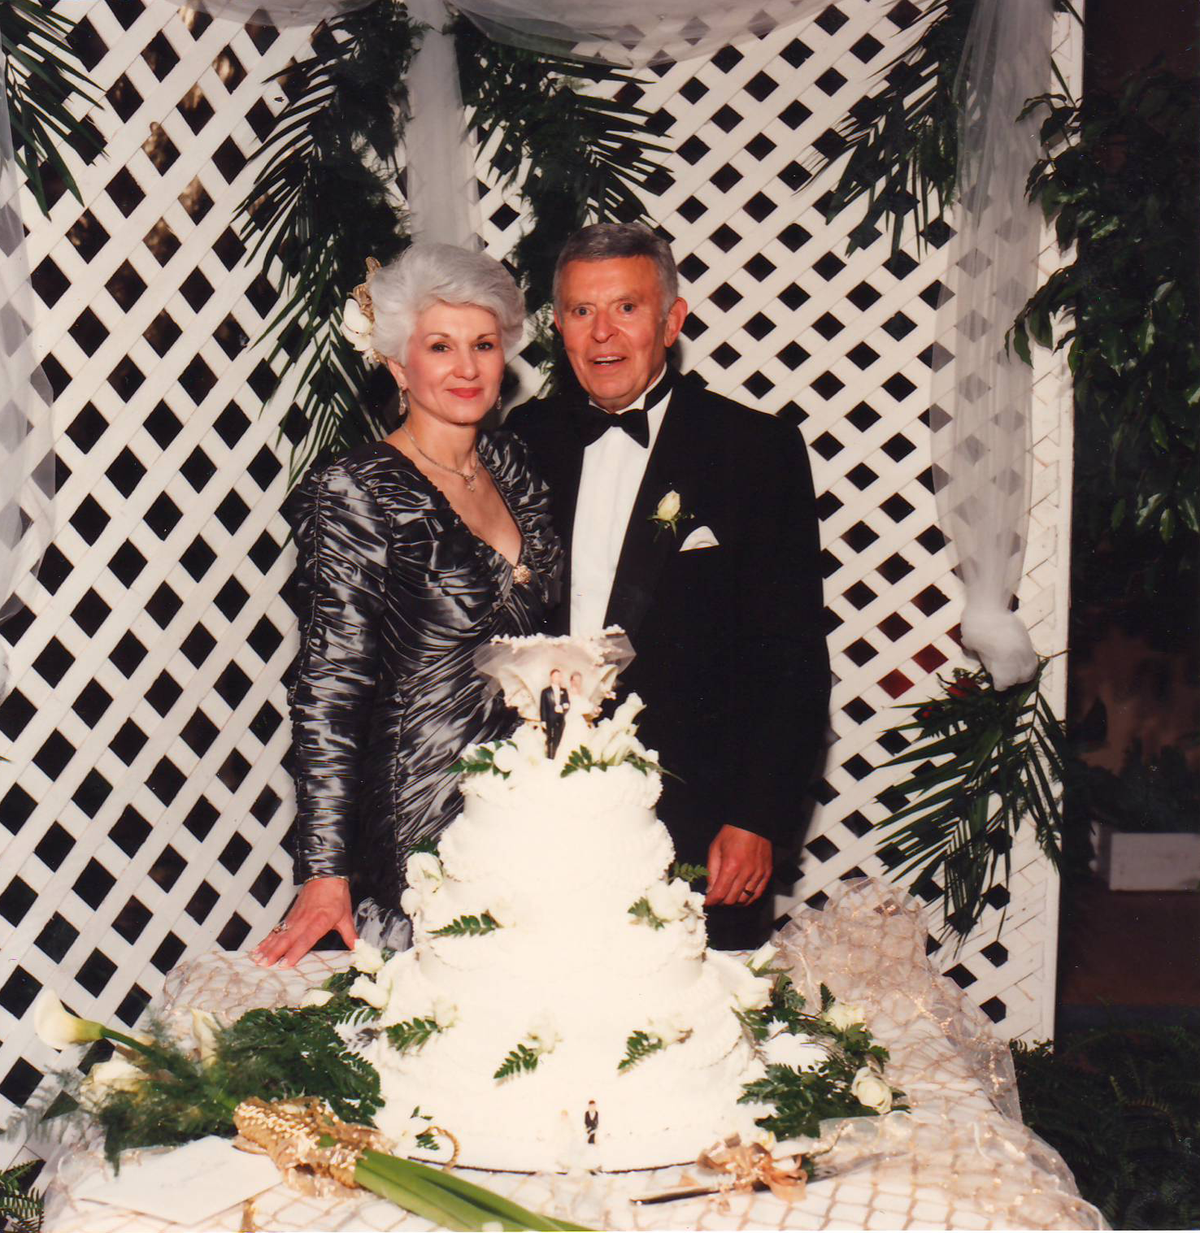 Becky and Jack Benaroya celebrating their 50th wedding anniversary, 1992.